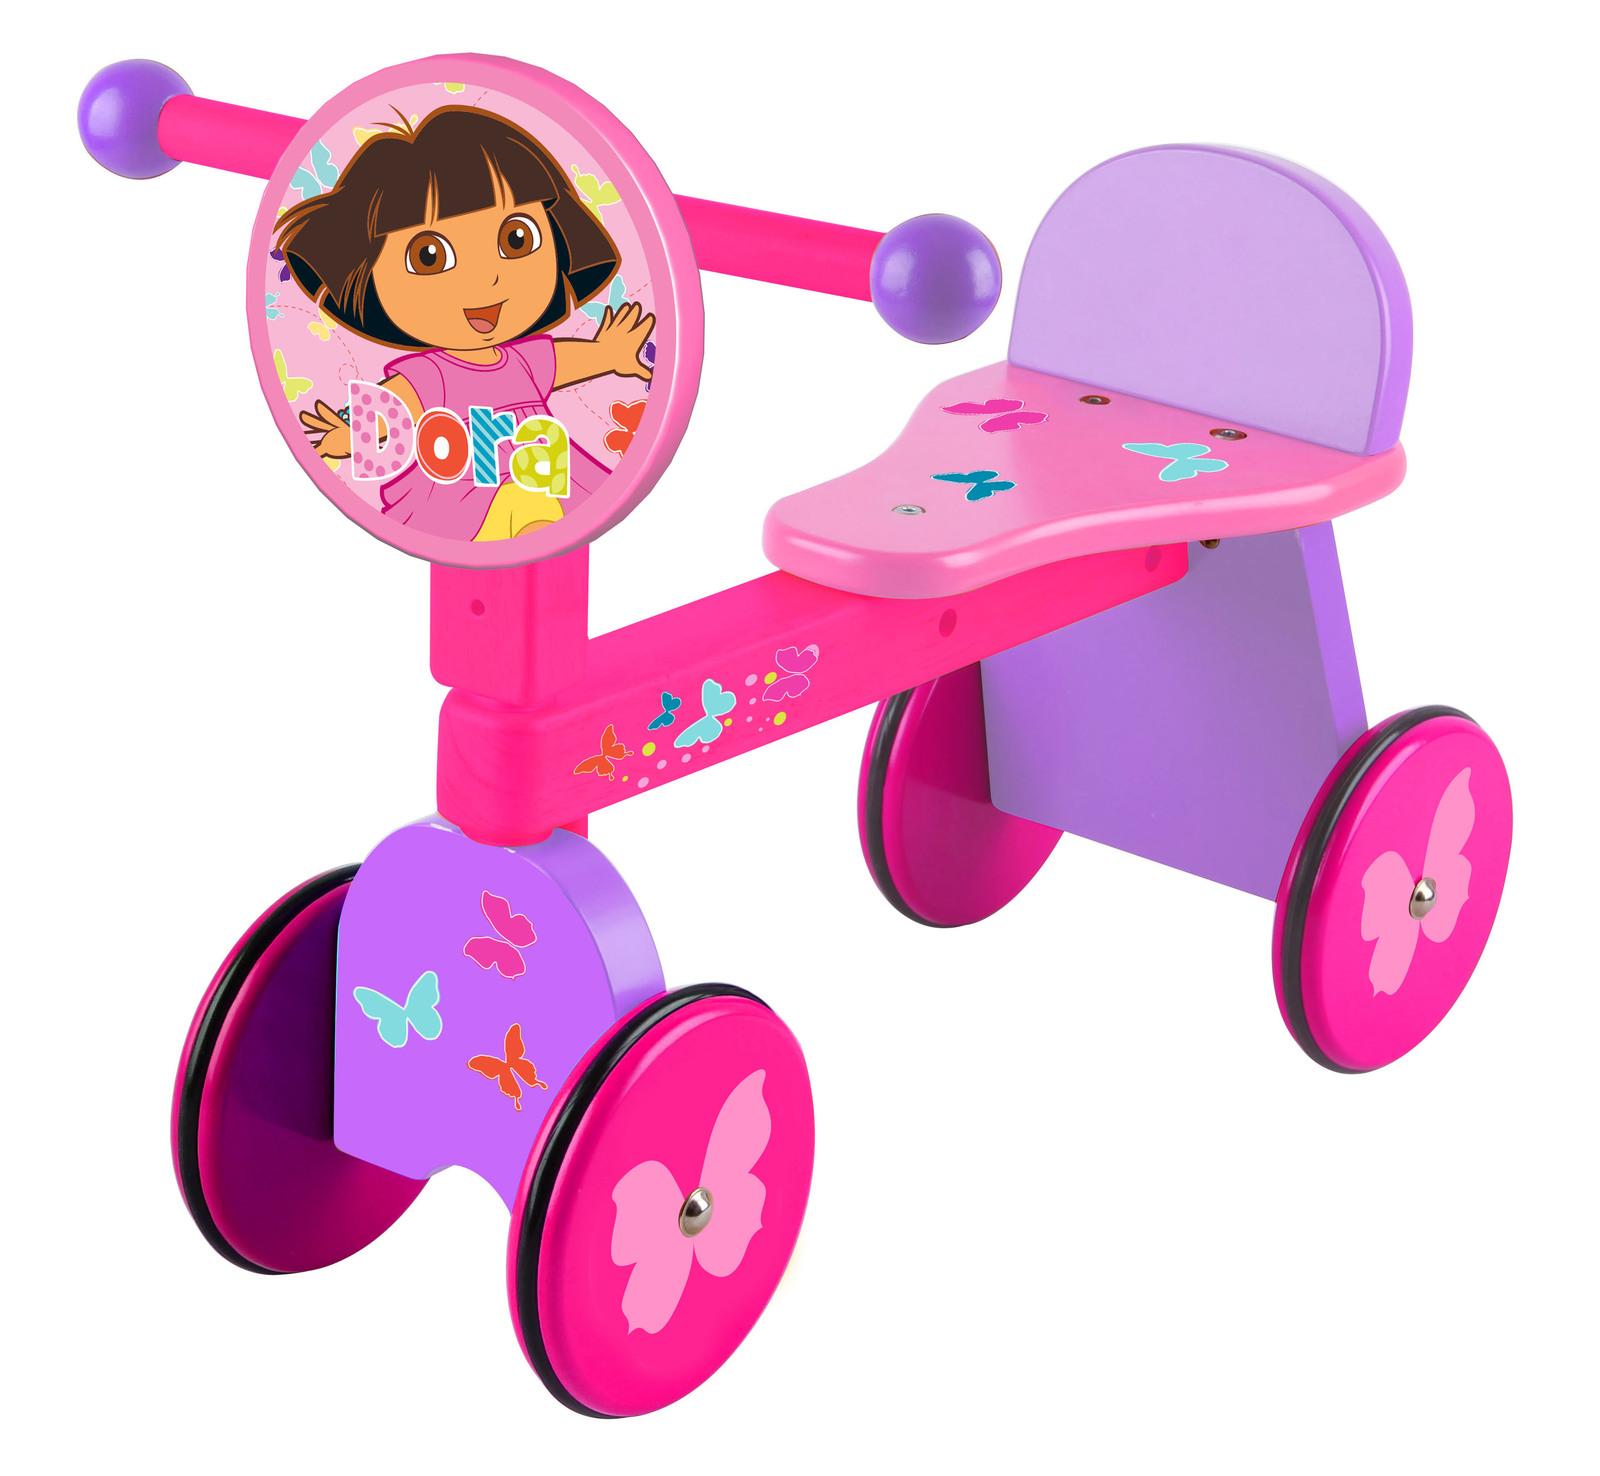 Dora The Explorer 4 Wheel Wooden Ride On Image